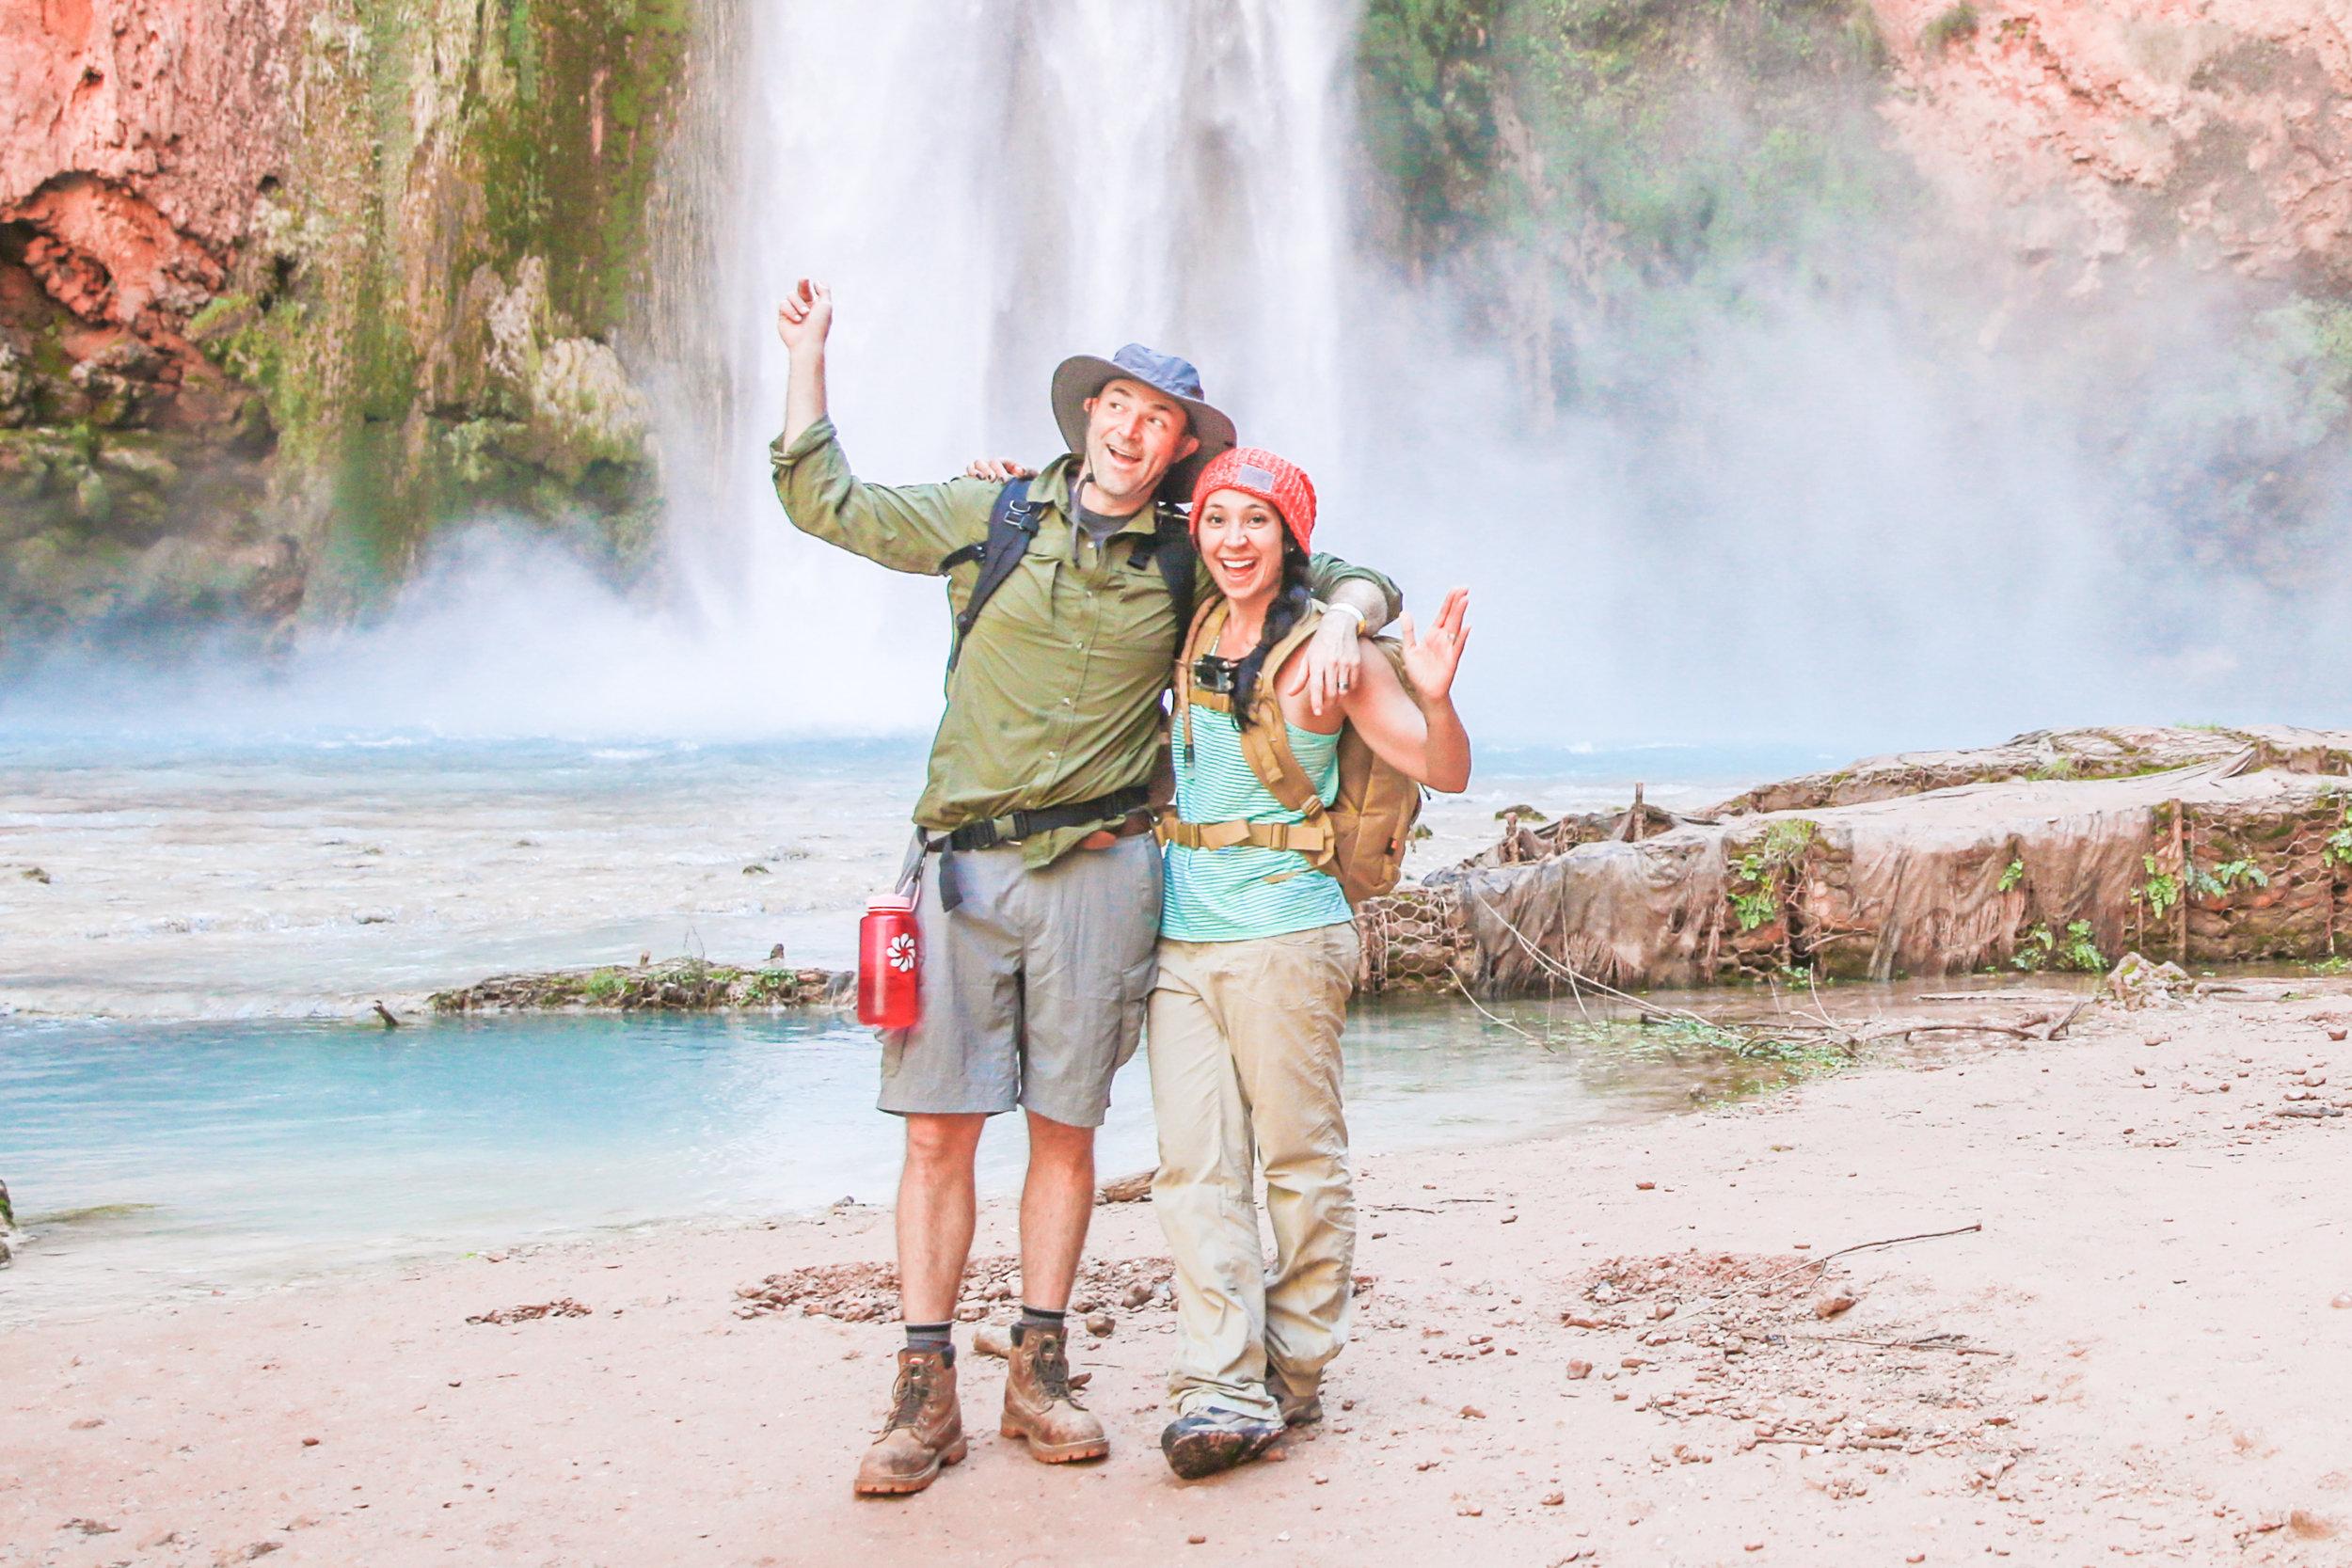 Do go chasing waterfalls.